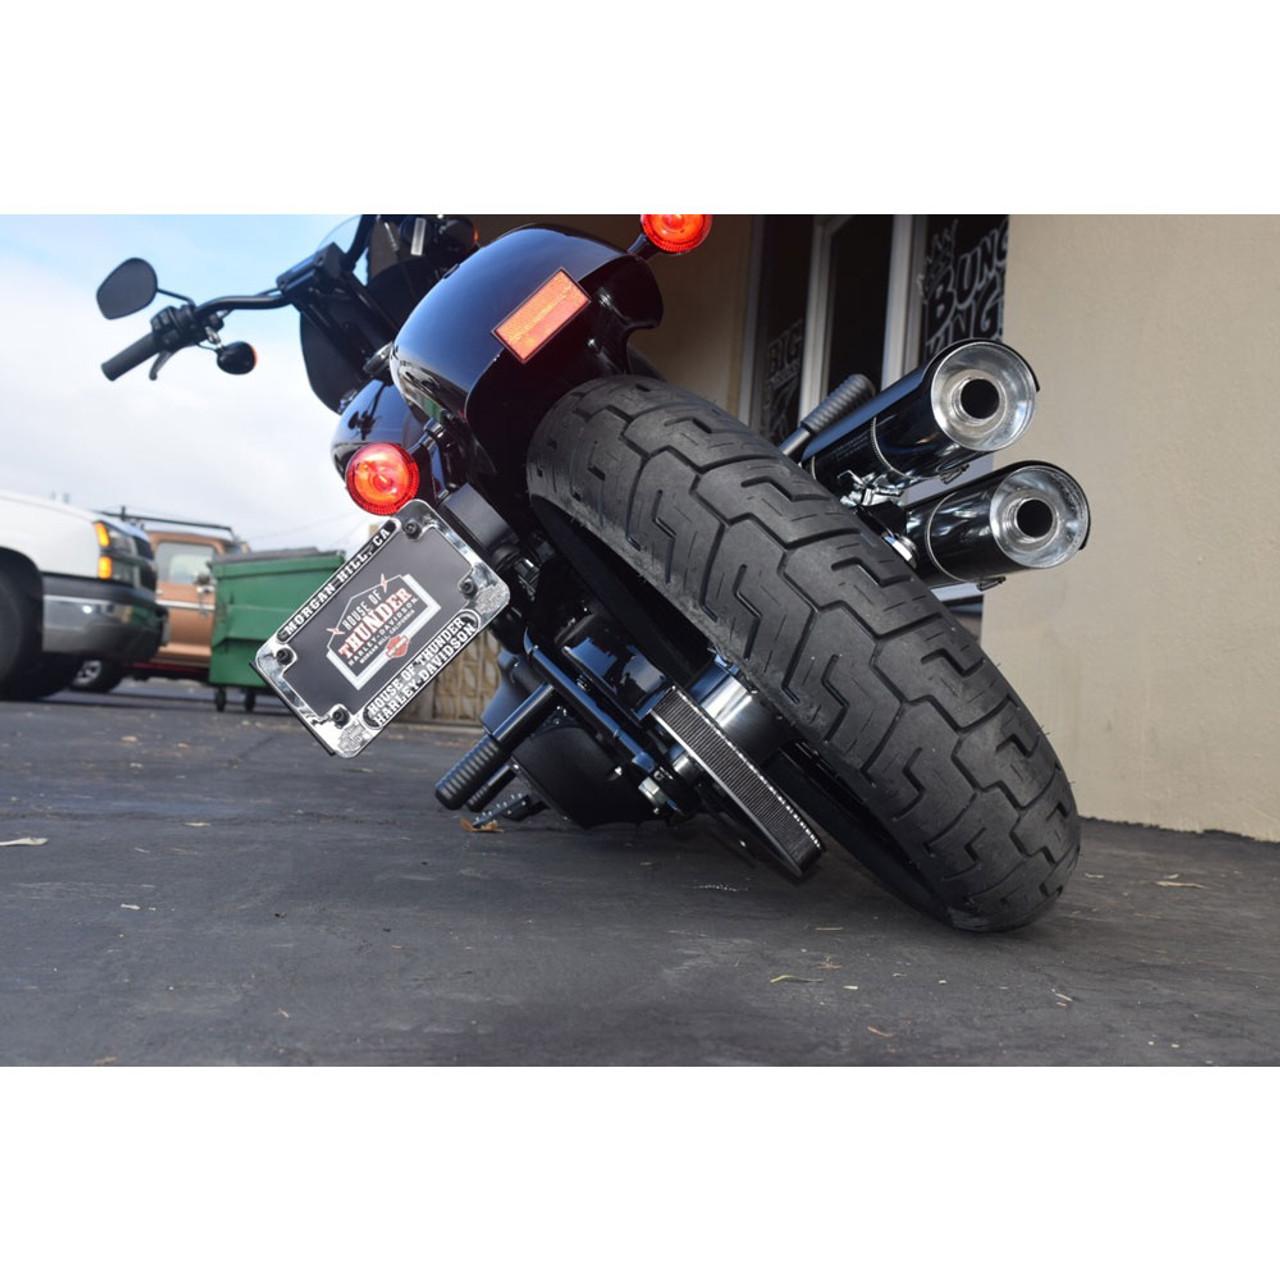 ONETK Passenger Peg Crash Bar,Frame Slider fits for Harley Davidson softail street bob,low riderand Heritage Classic 2018-2020,Left and Right